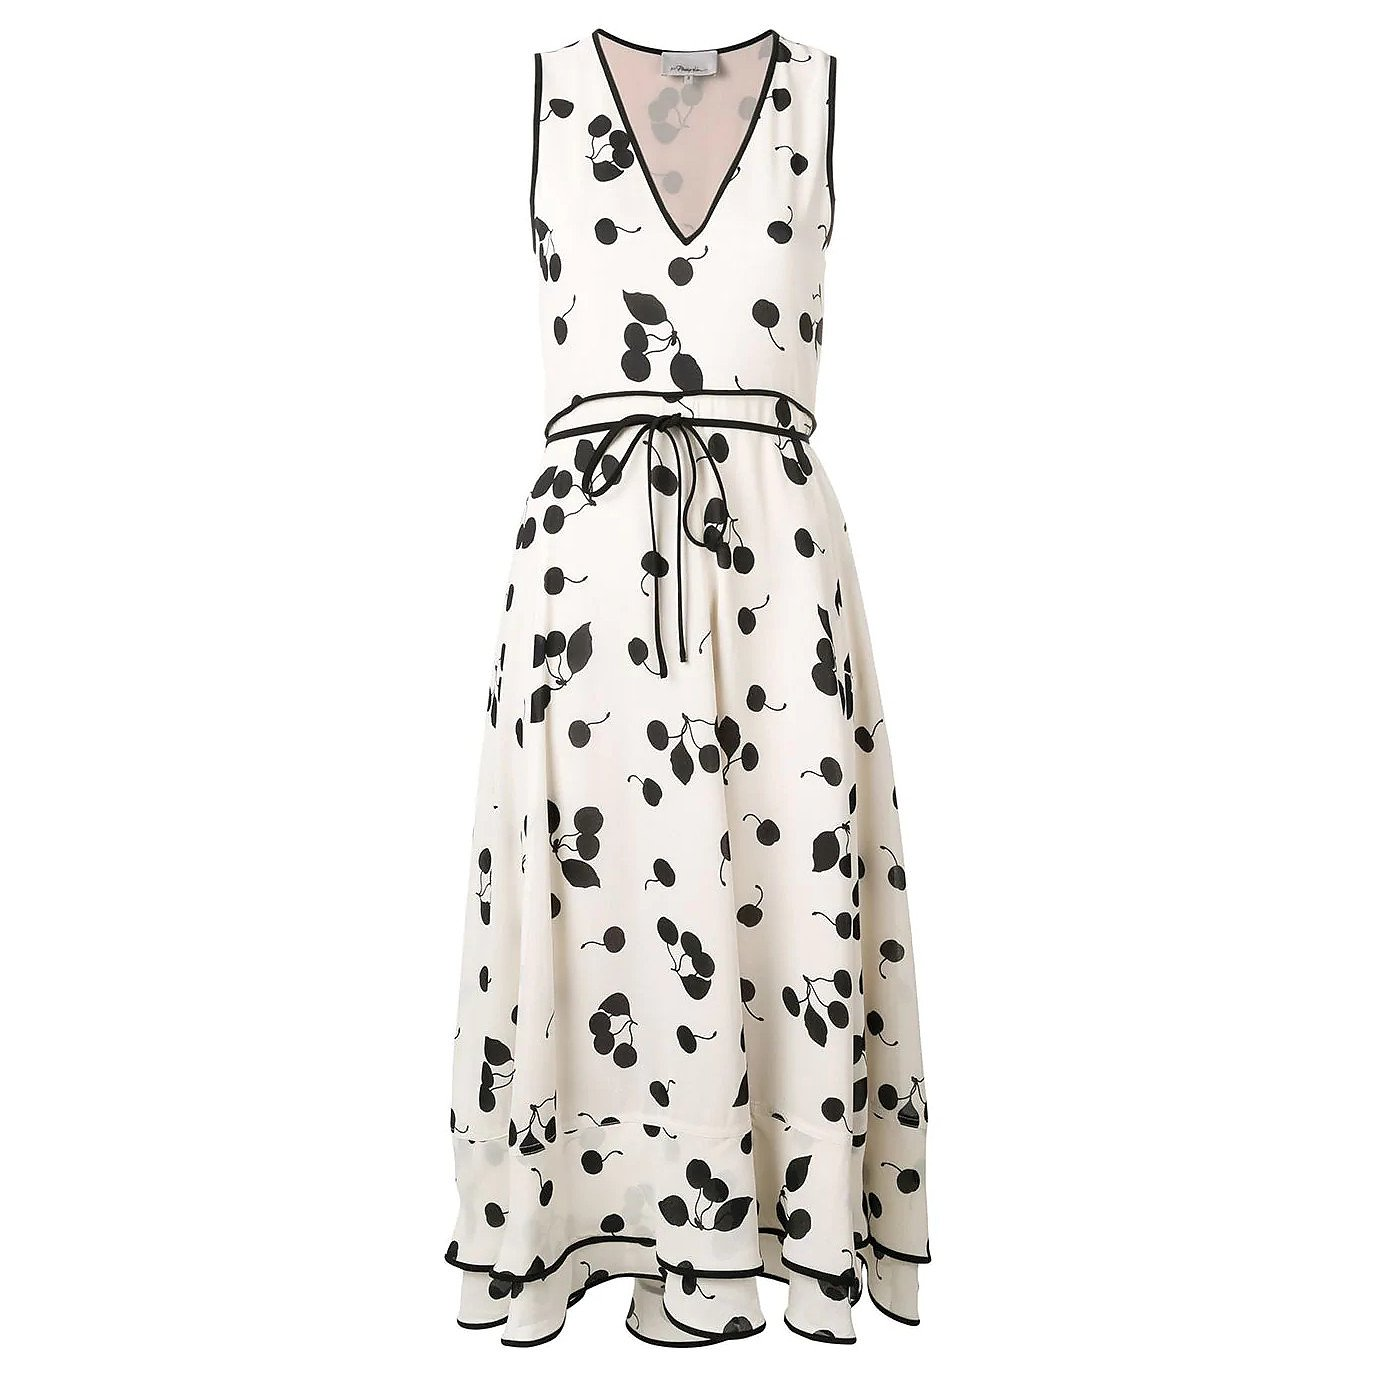 3.1 Phillip Lim Cerise Print Midi Dress